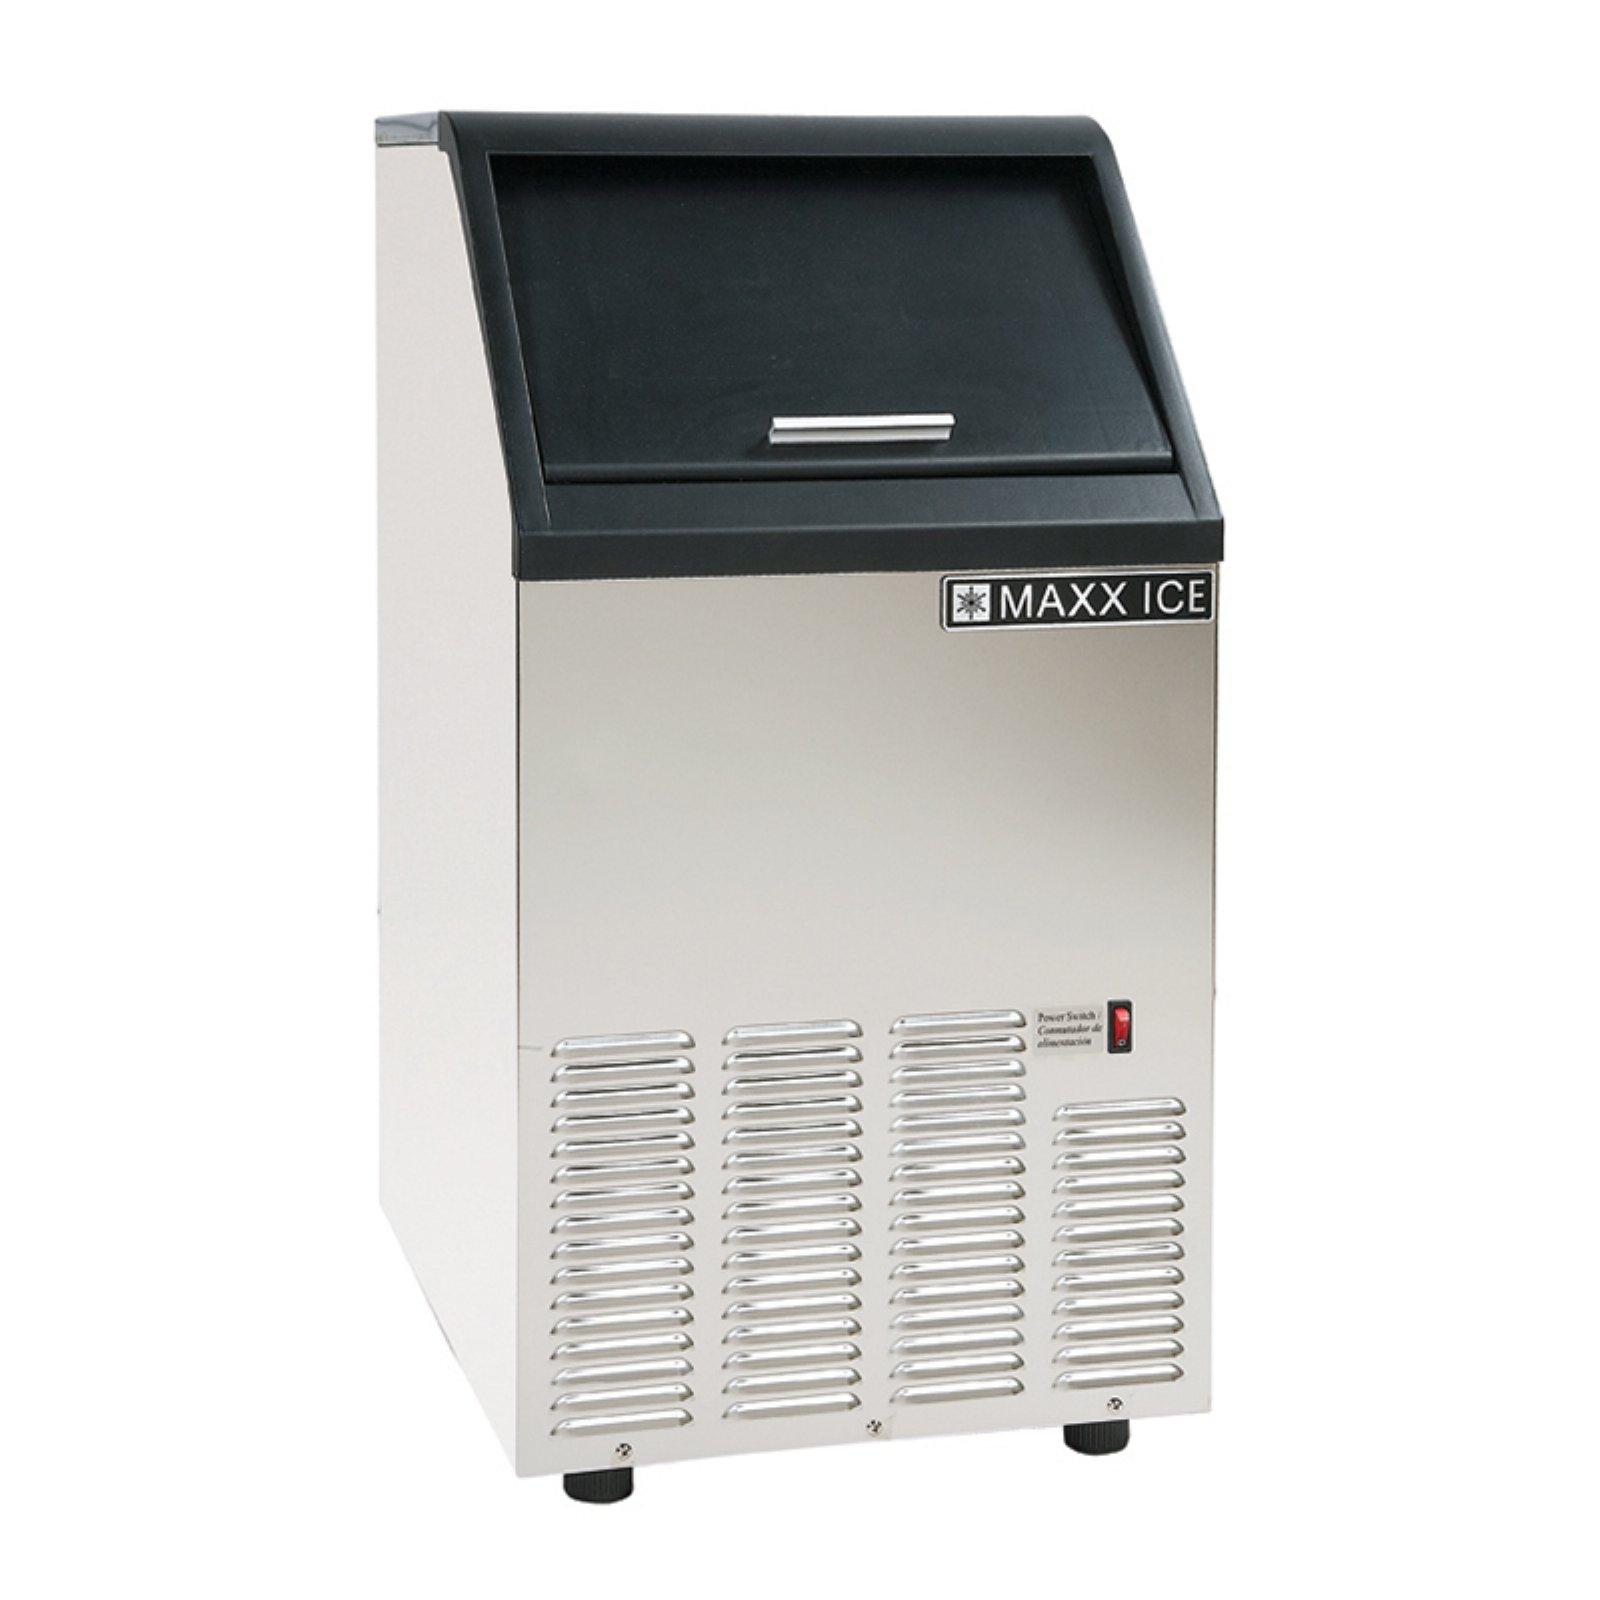 Maxximum 75 lb. Ice Maker